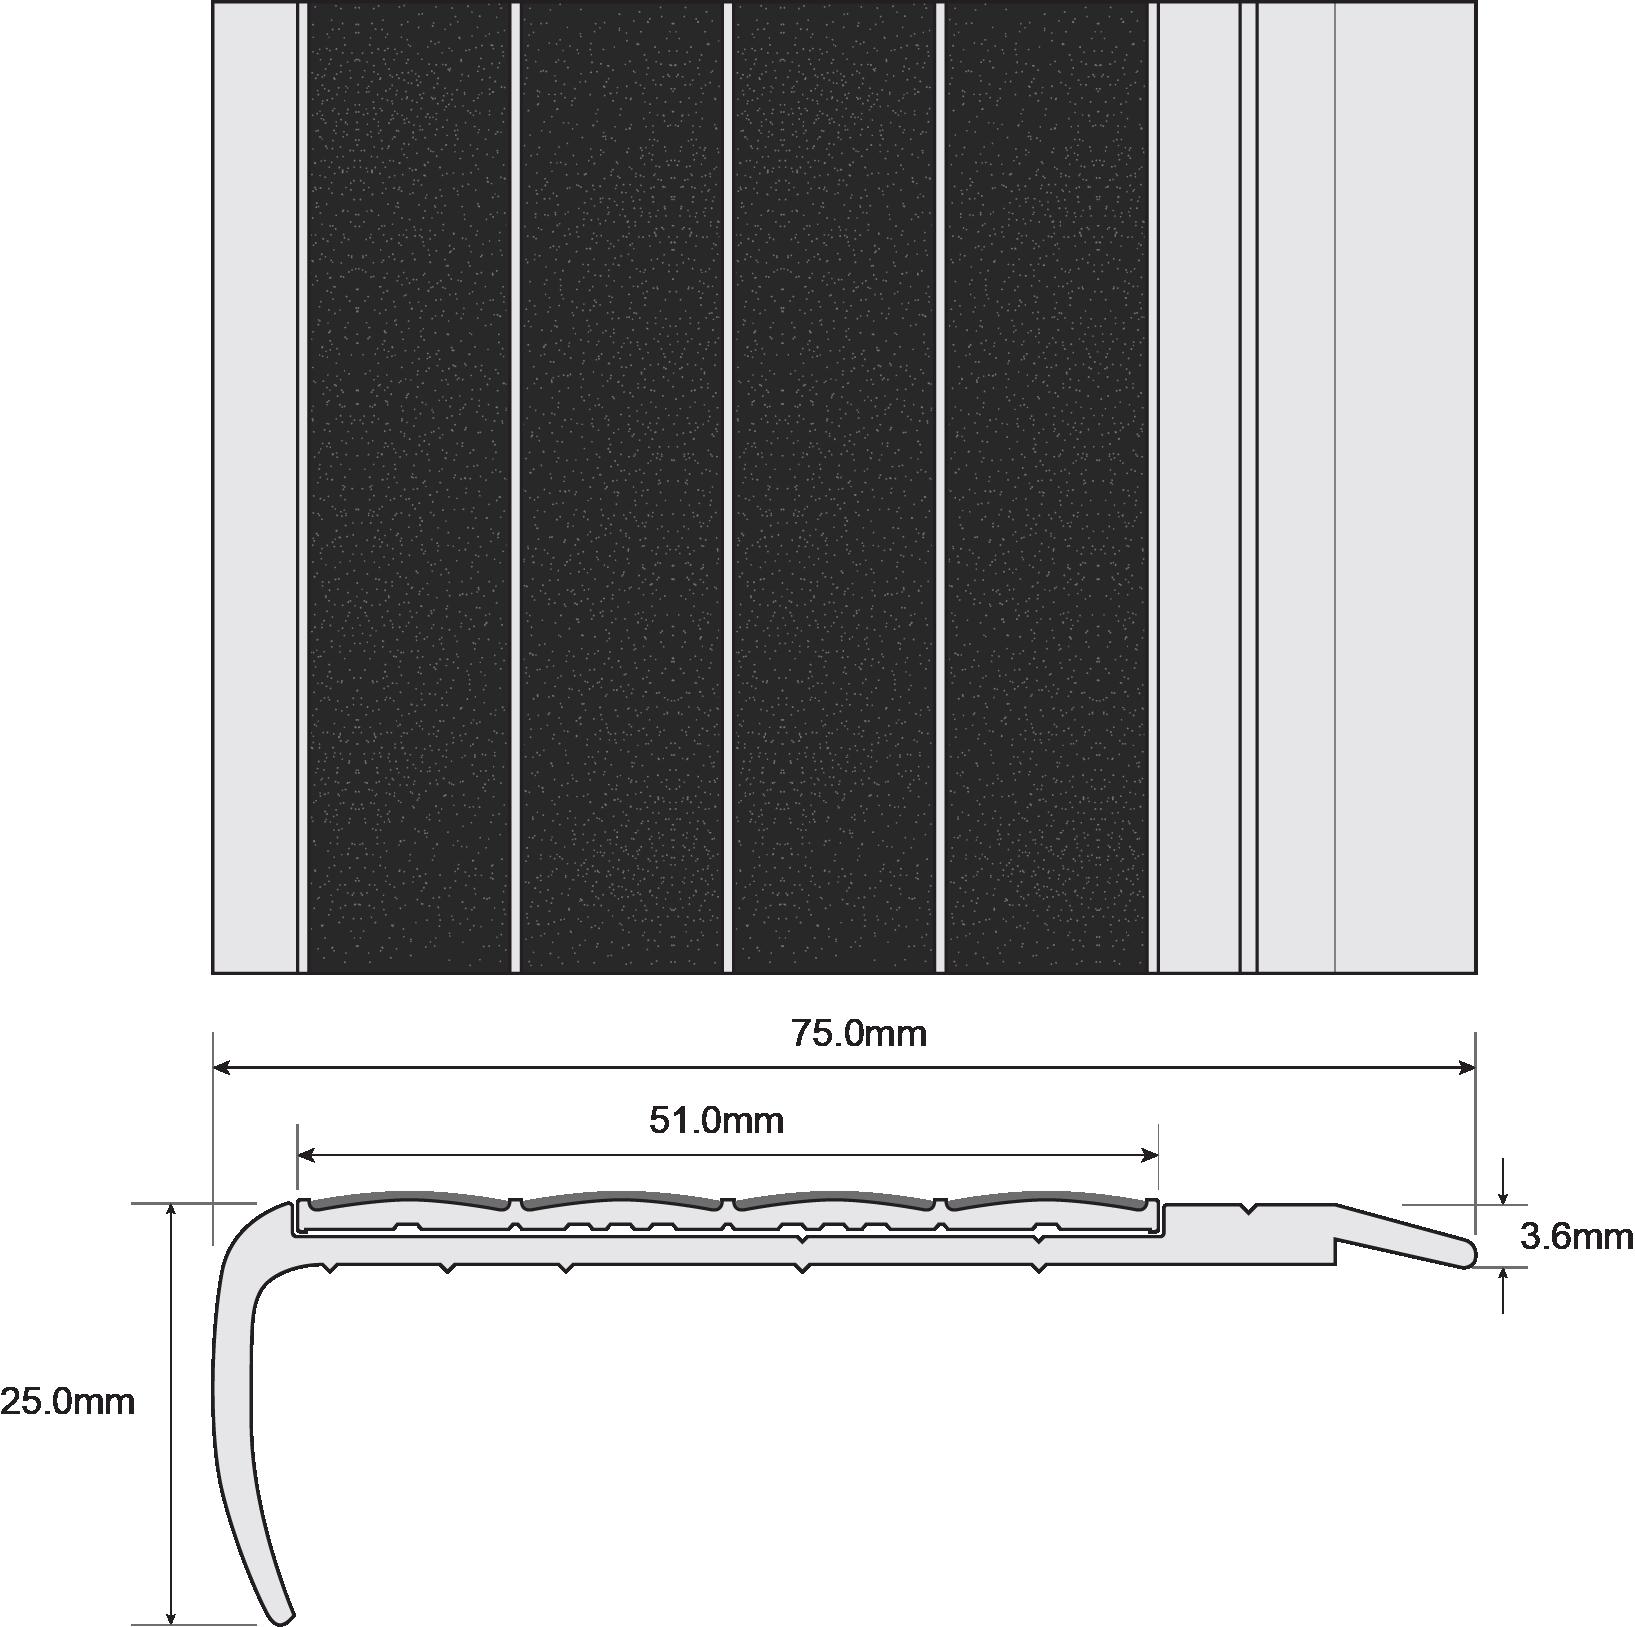 ESP Stair Nosing 25x75mm F8170 BLACK Technical Drawing